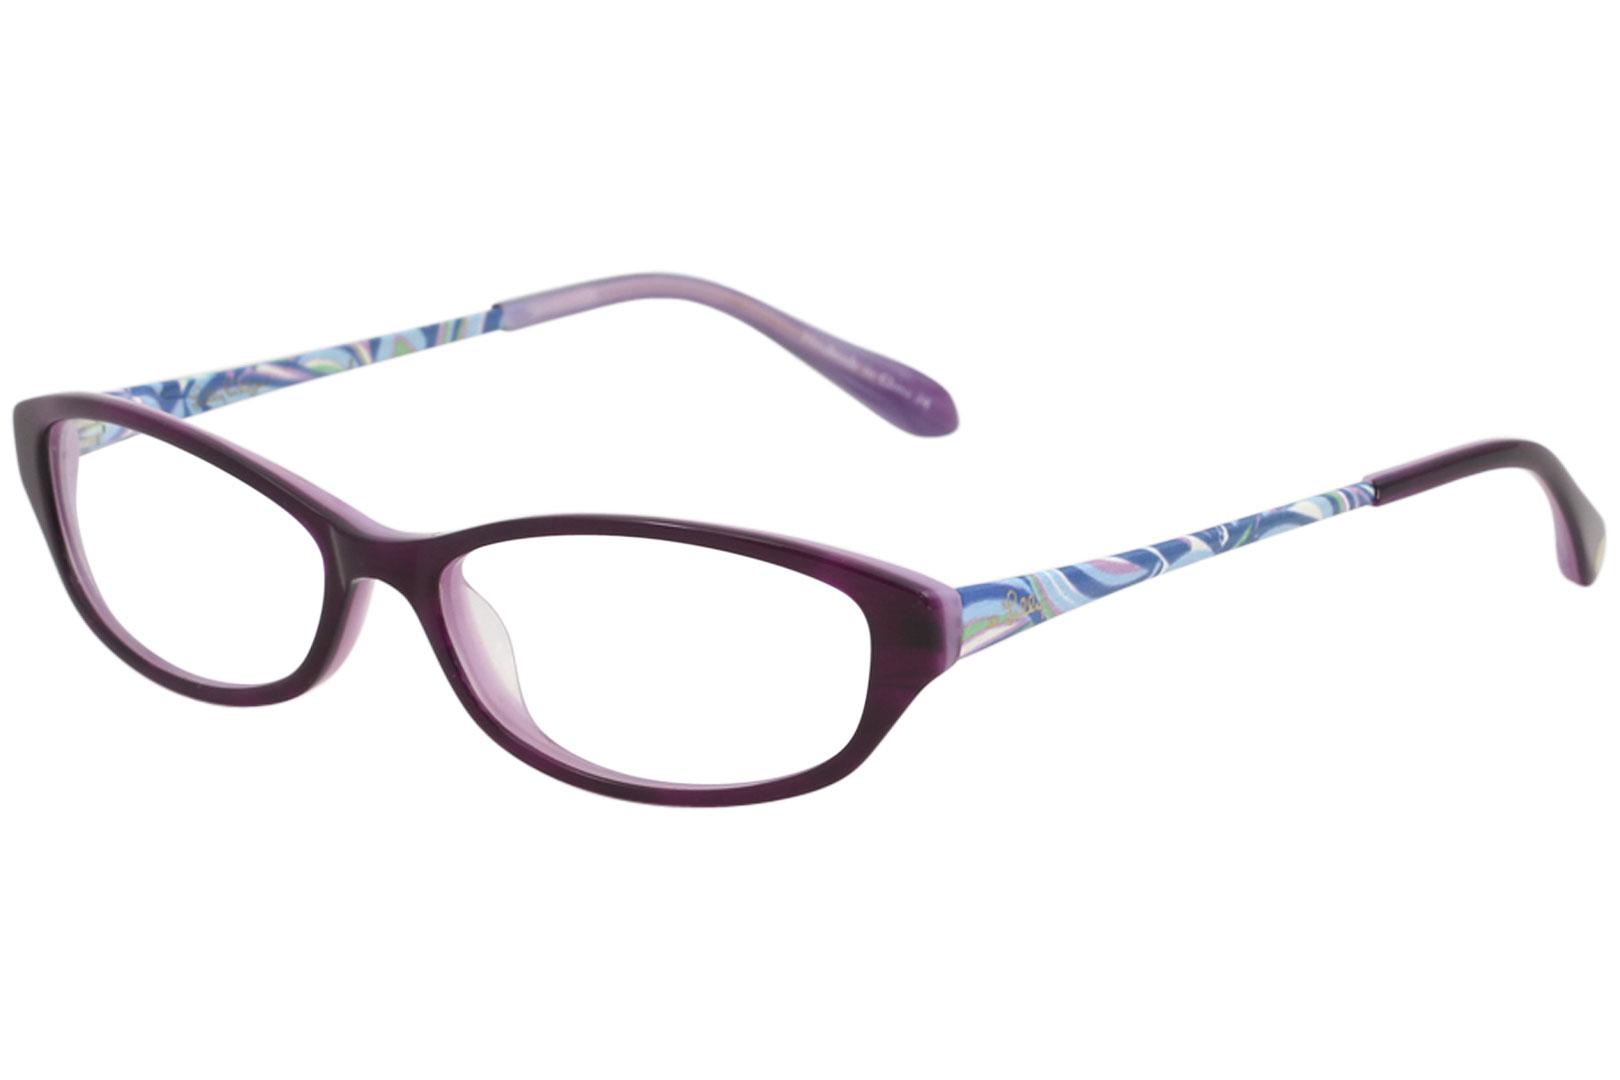 247b8ceb63 Lilly Pulitzer Women s Eyeglasses Avaline PL Purple Full Rim Optical ...